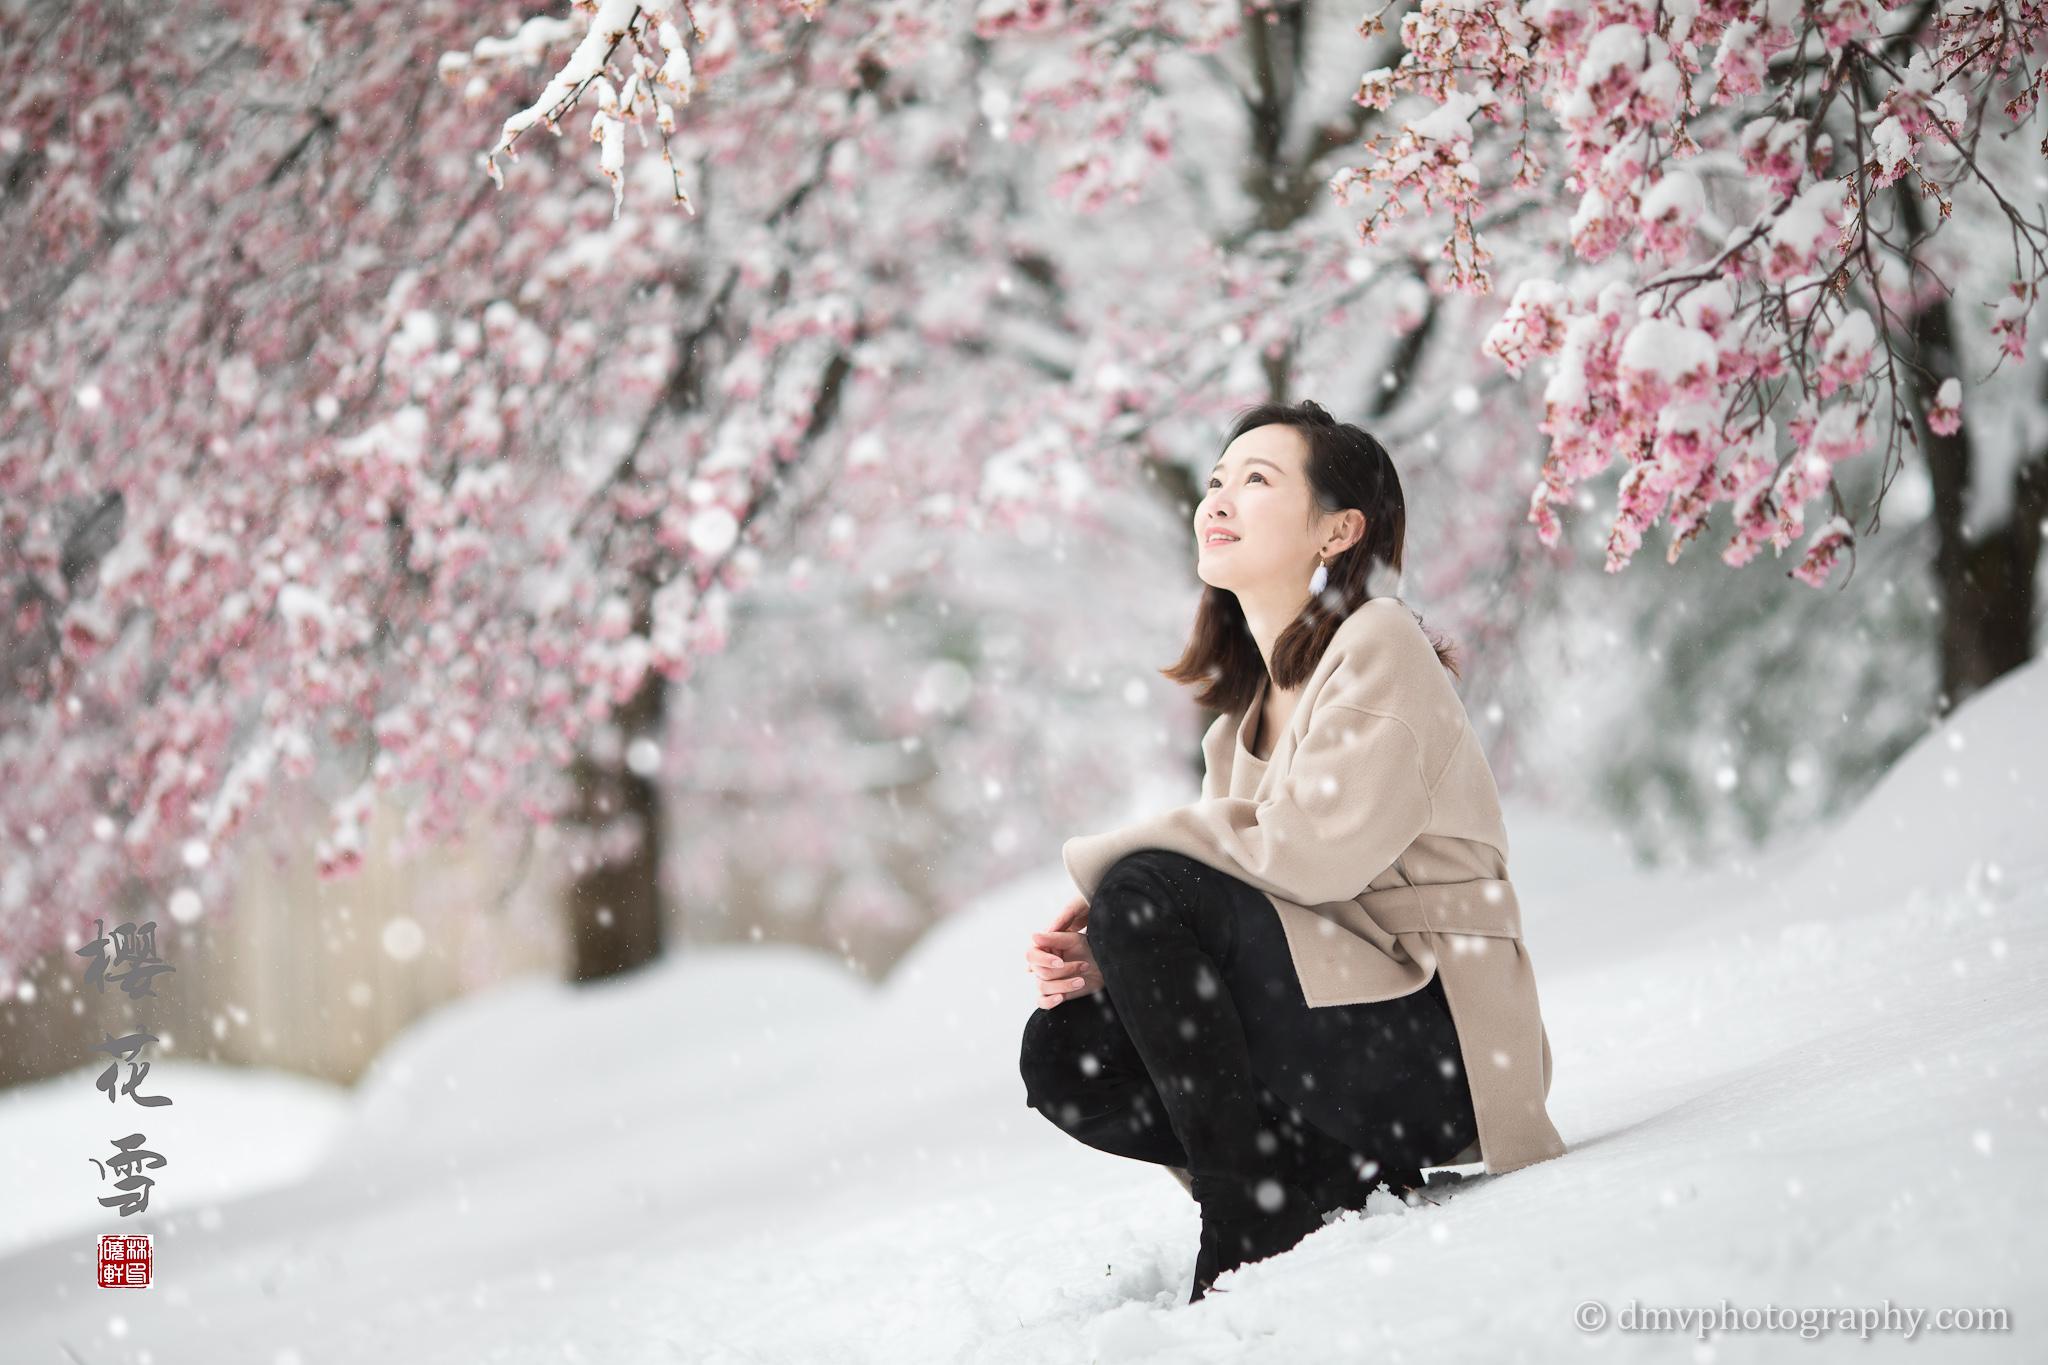 _D4_8300-snow